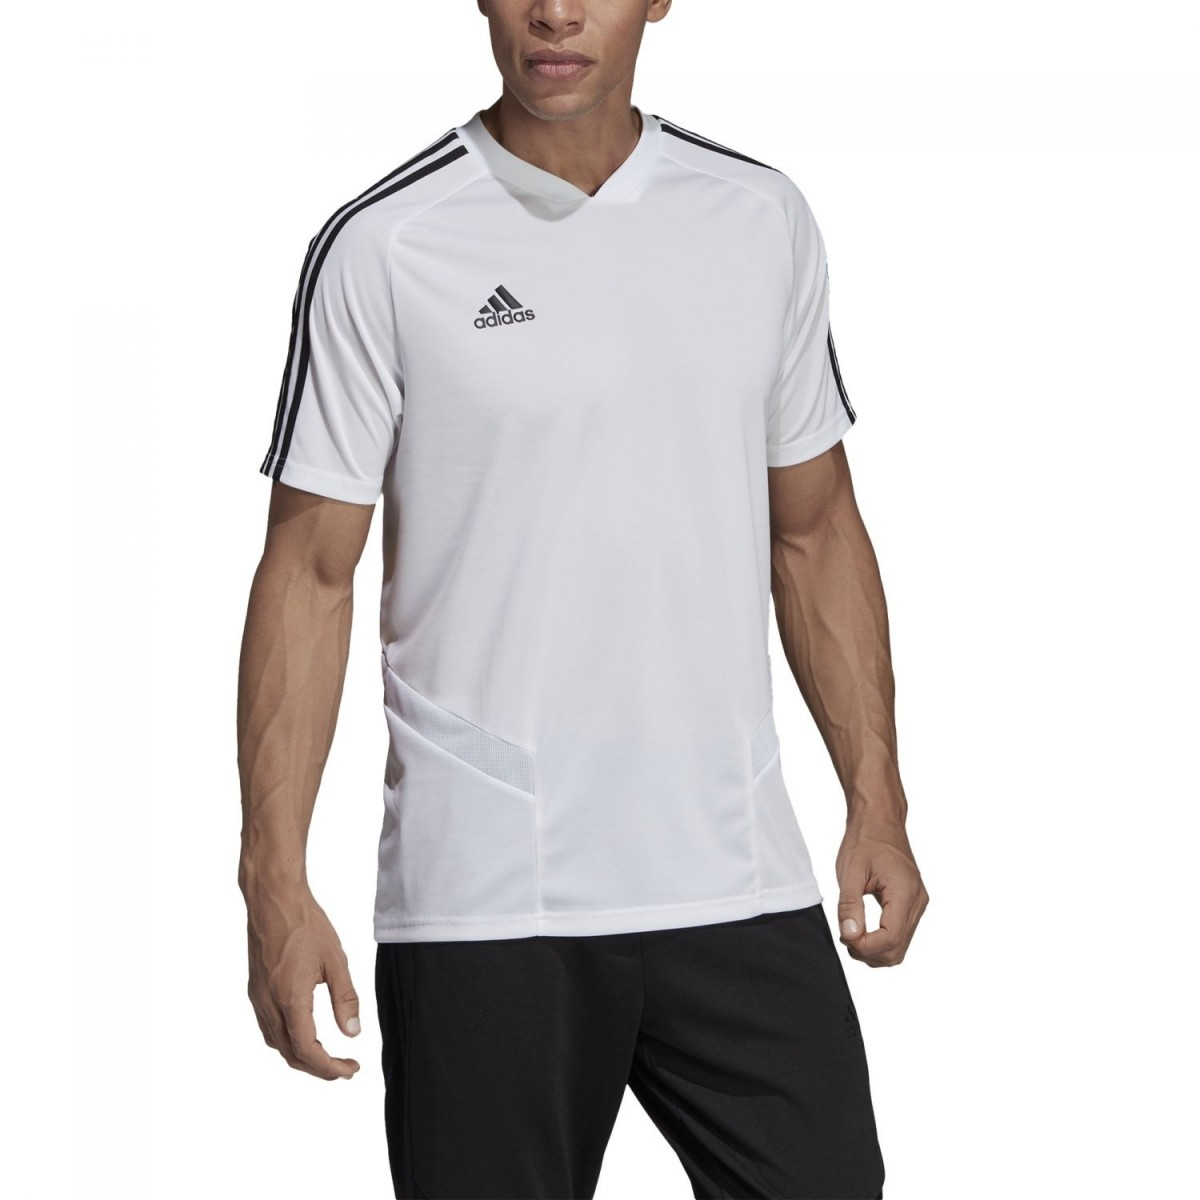 adidas Tiro 19 Trainingsshirt